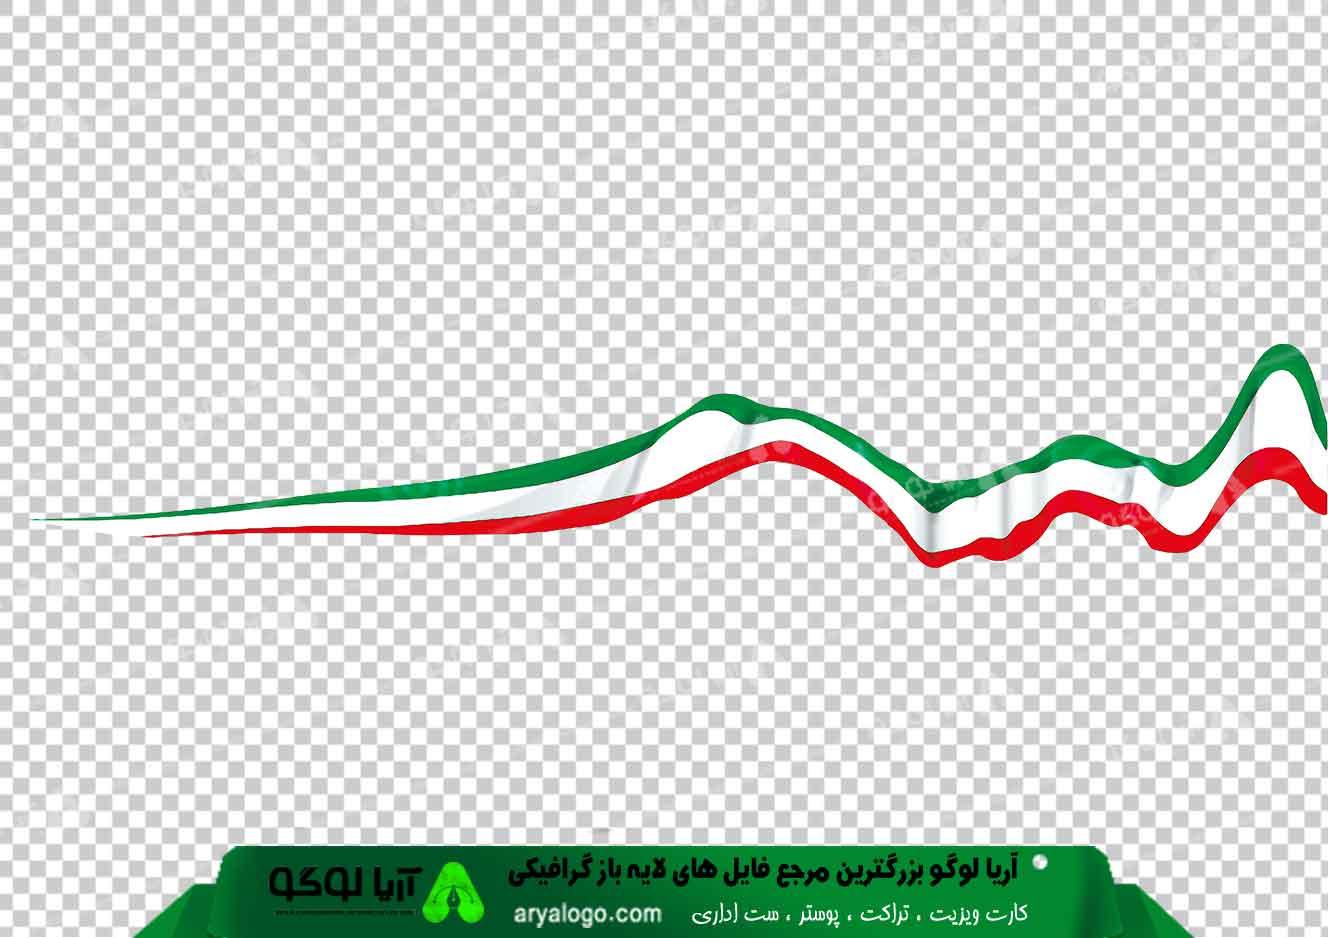 وکتور png پرچم ایران 21